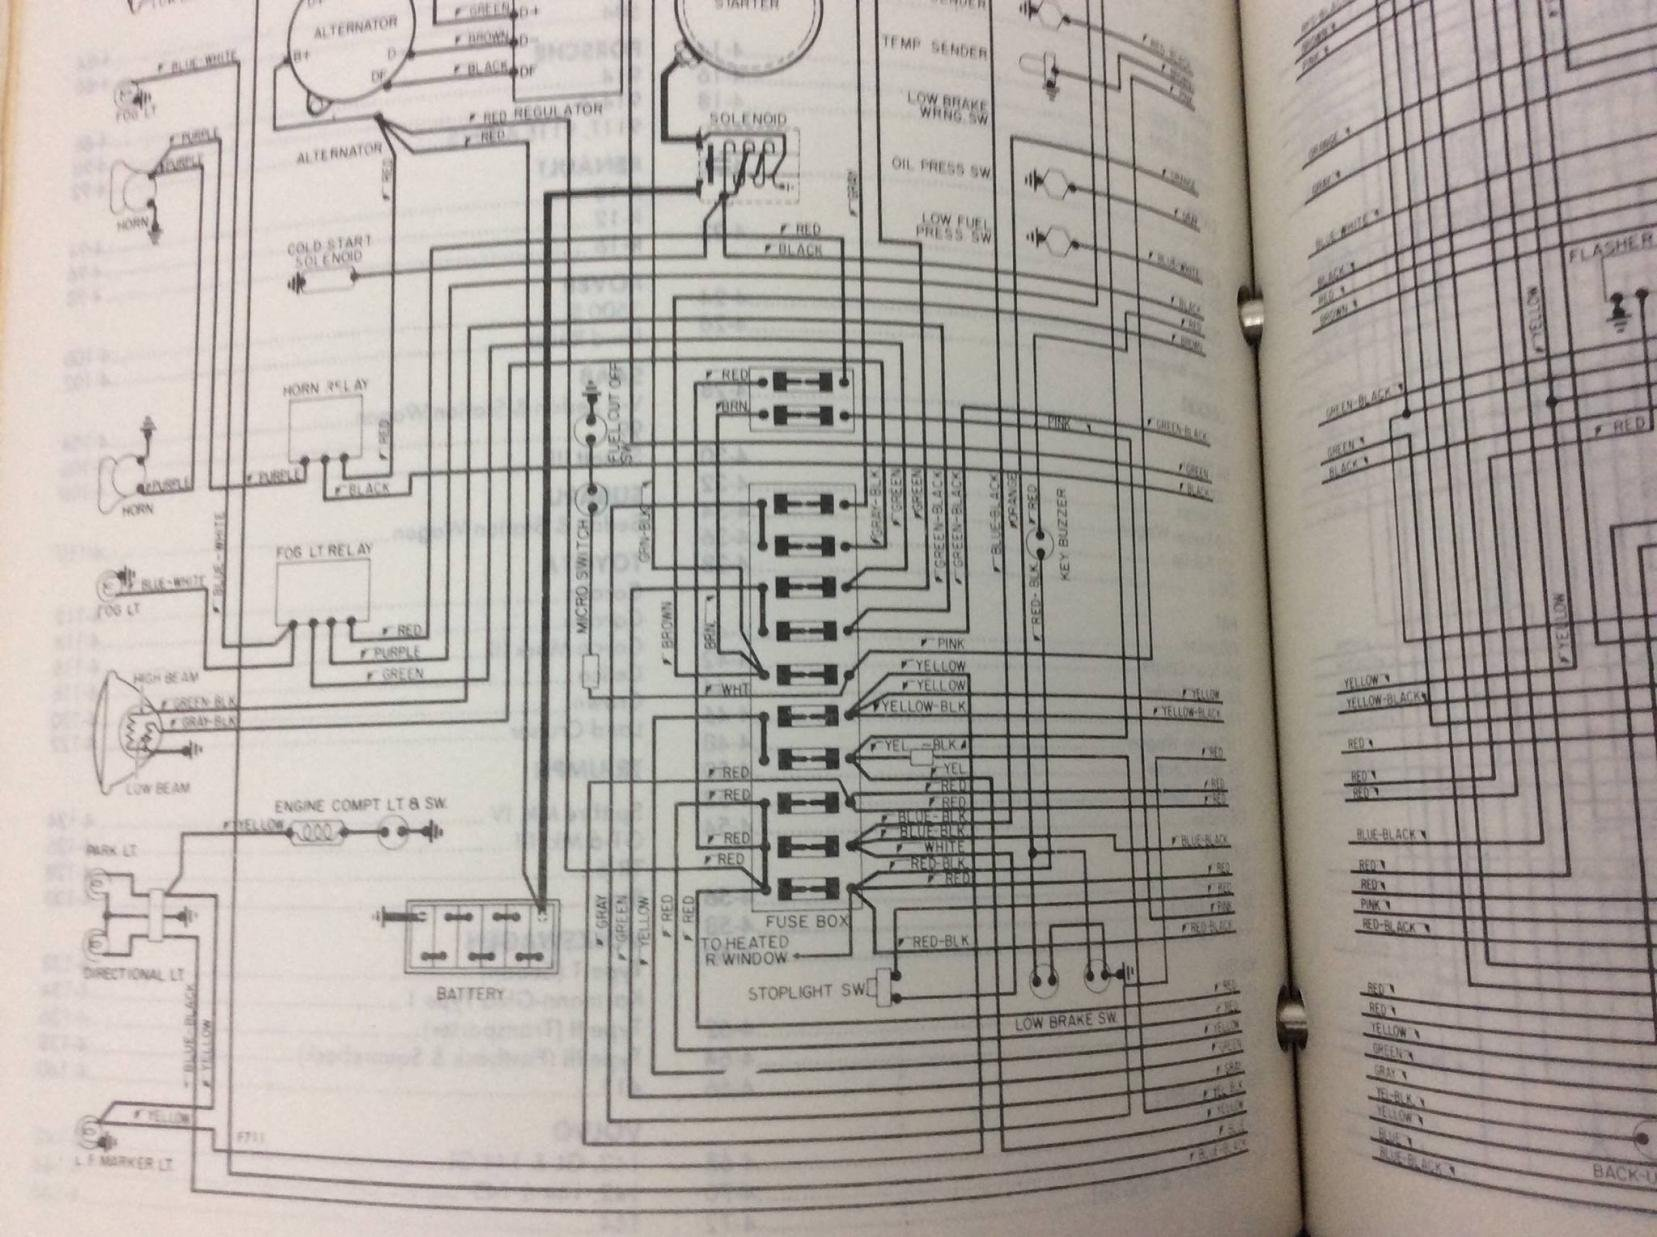 Wiring Diagram needed - Alfa Romeo Bulletin Board & Forums on